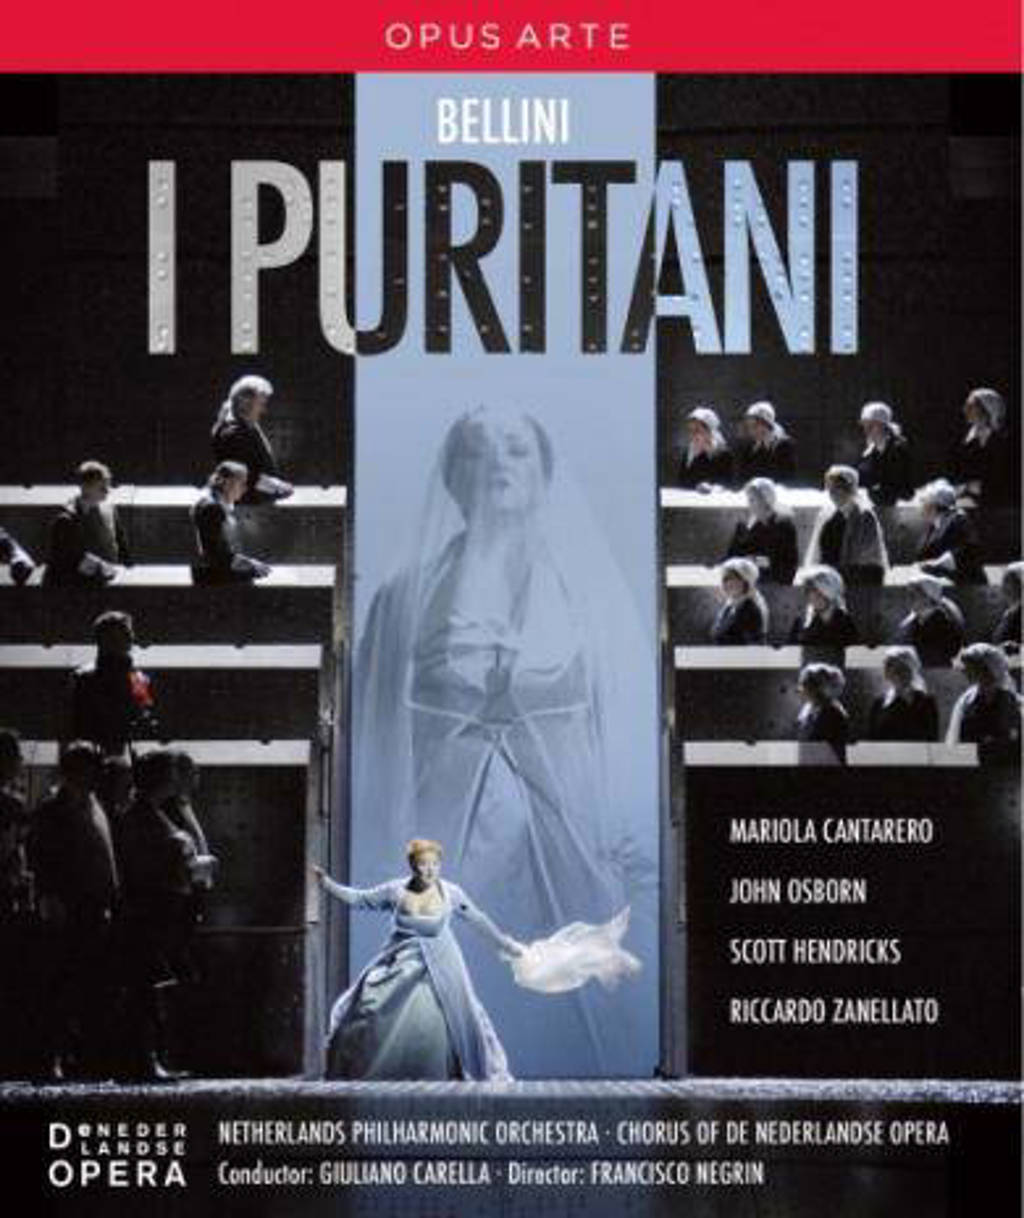 Borowski/Zanellato/Osborn/Ned.Philh - I Puritani (Blu-ray)